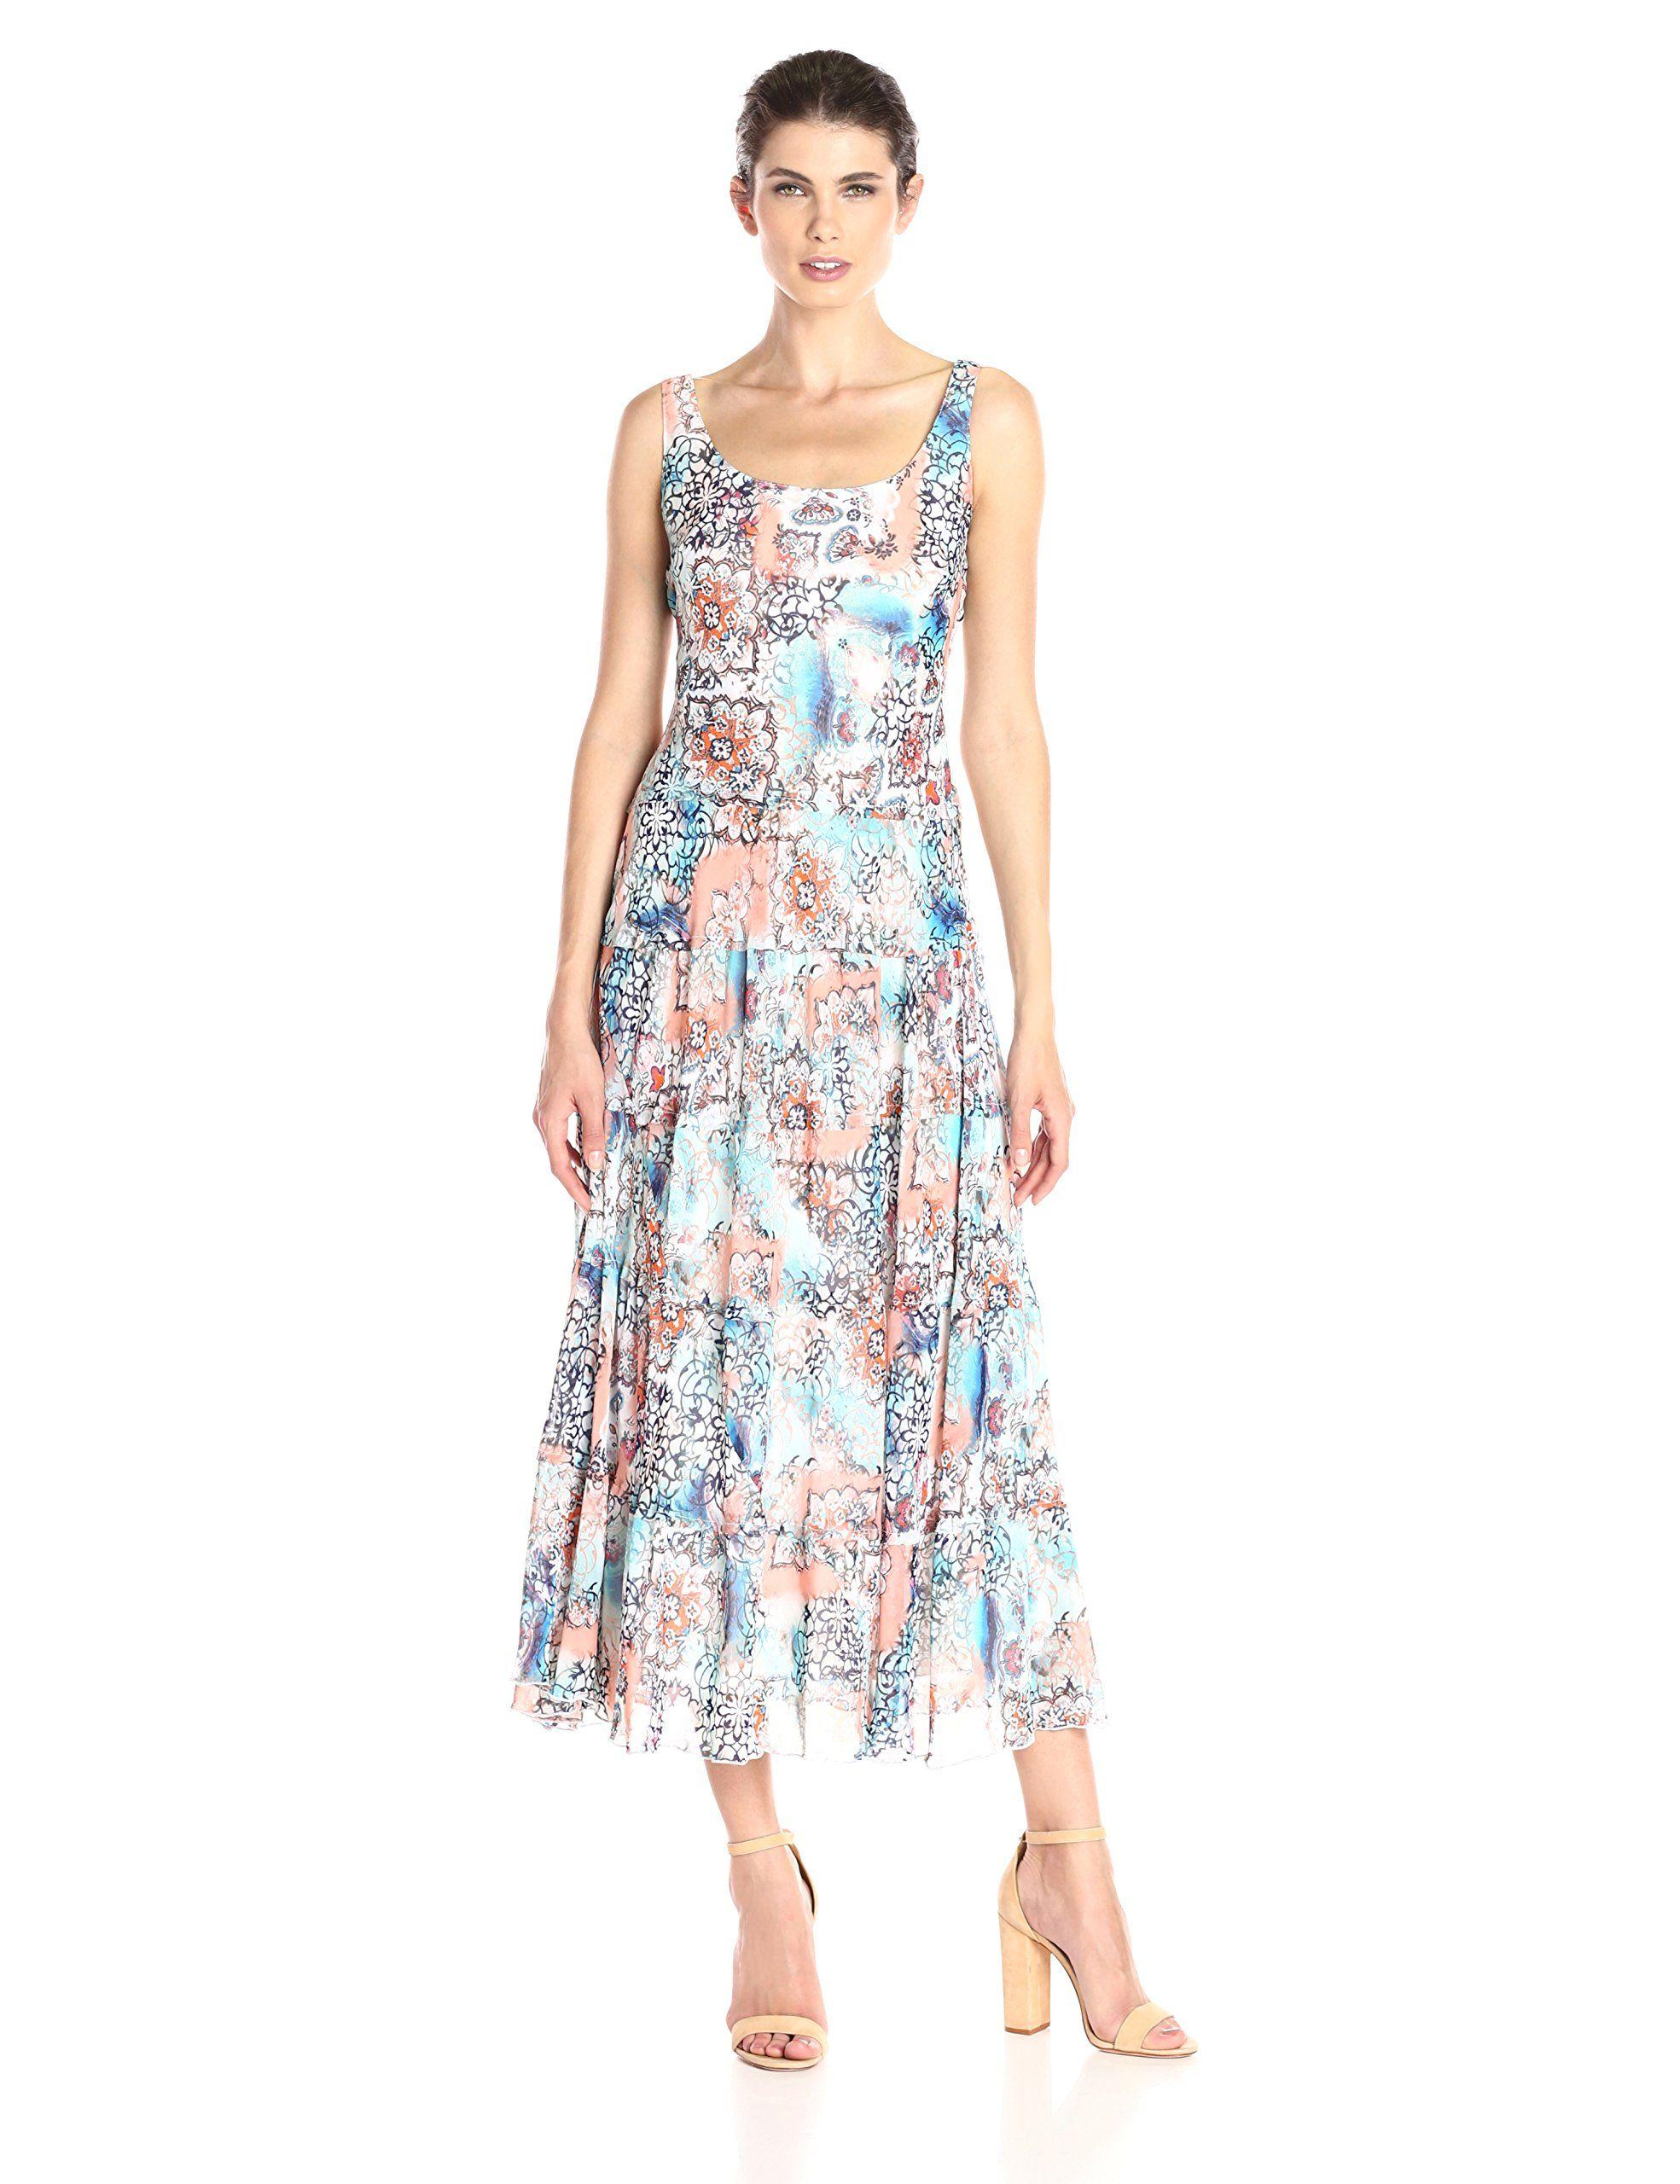 Betsey johnson wedding dresses  Kasper Womenus Multi Tiered Maxi  fashions  Pinterest  Shop Free